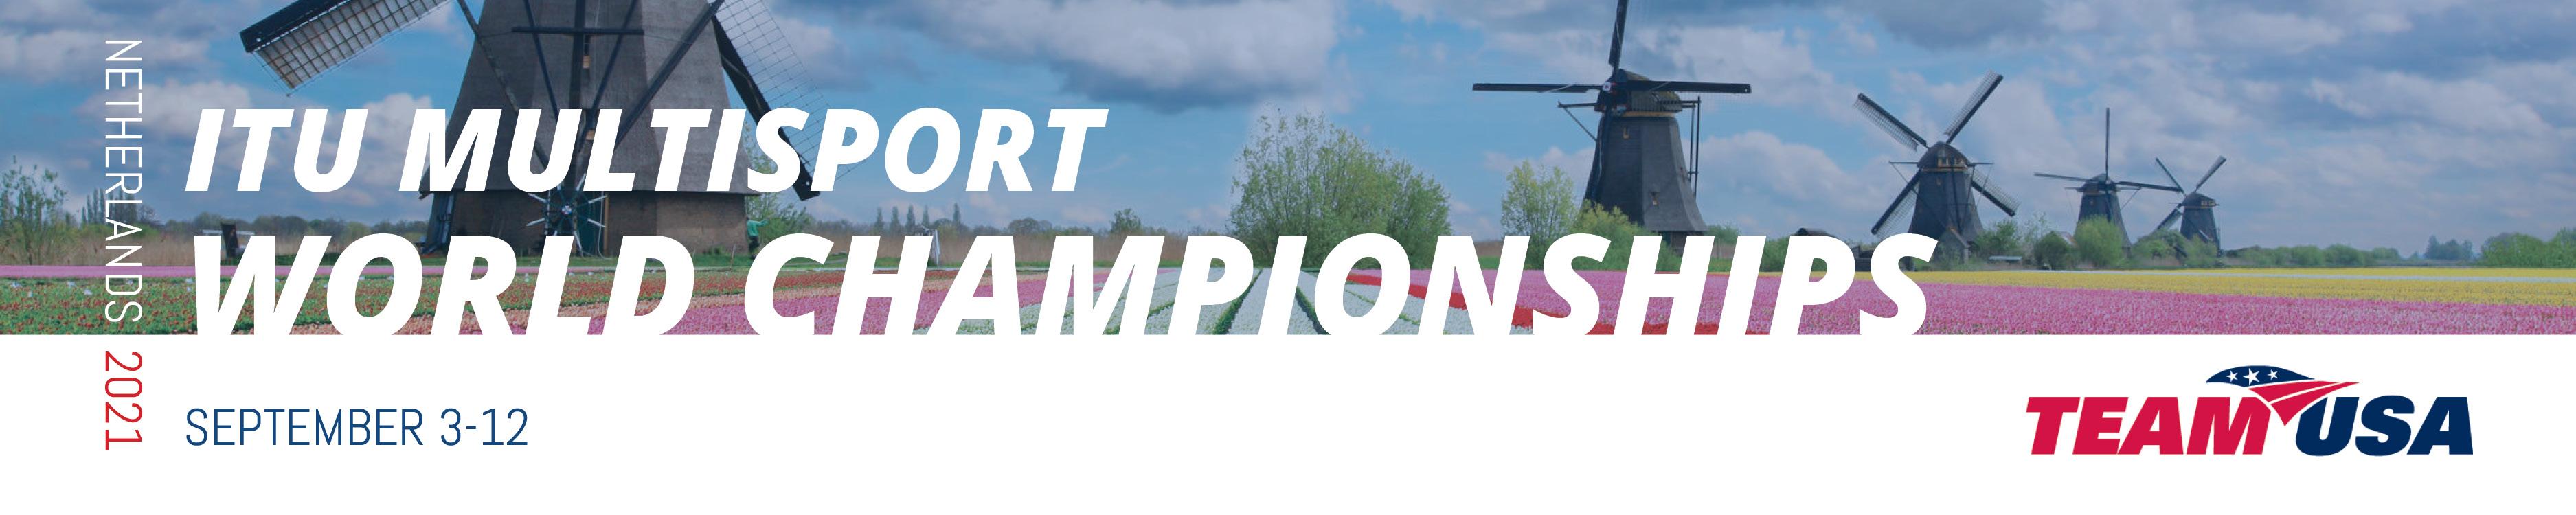 Almere 2021 ITU Multisport World Championships